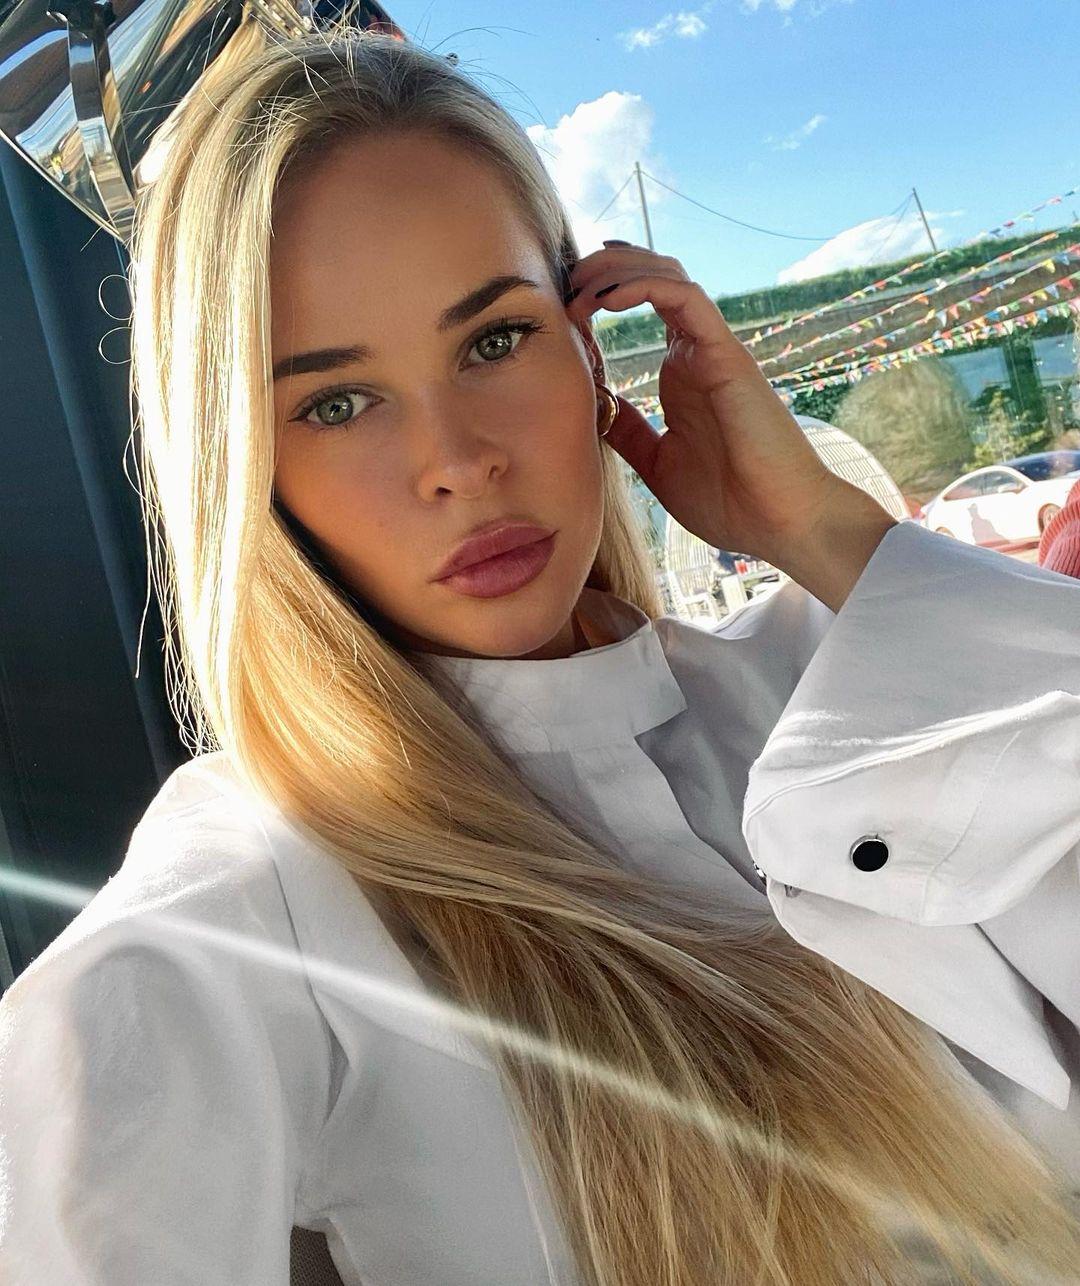 Vlada-Sharpilova-Wallpapers-Insta-Fit-Bio-17